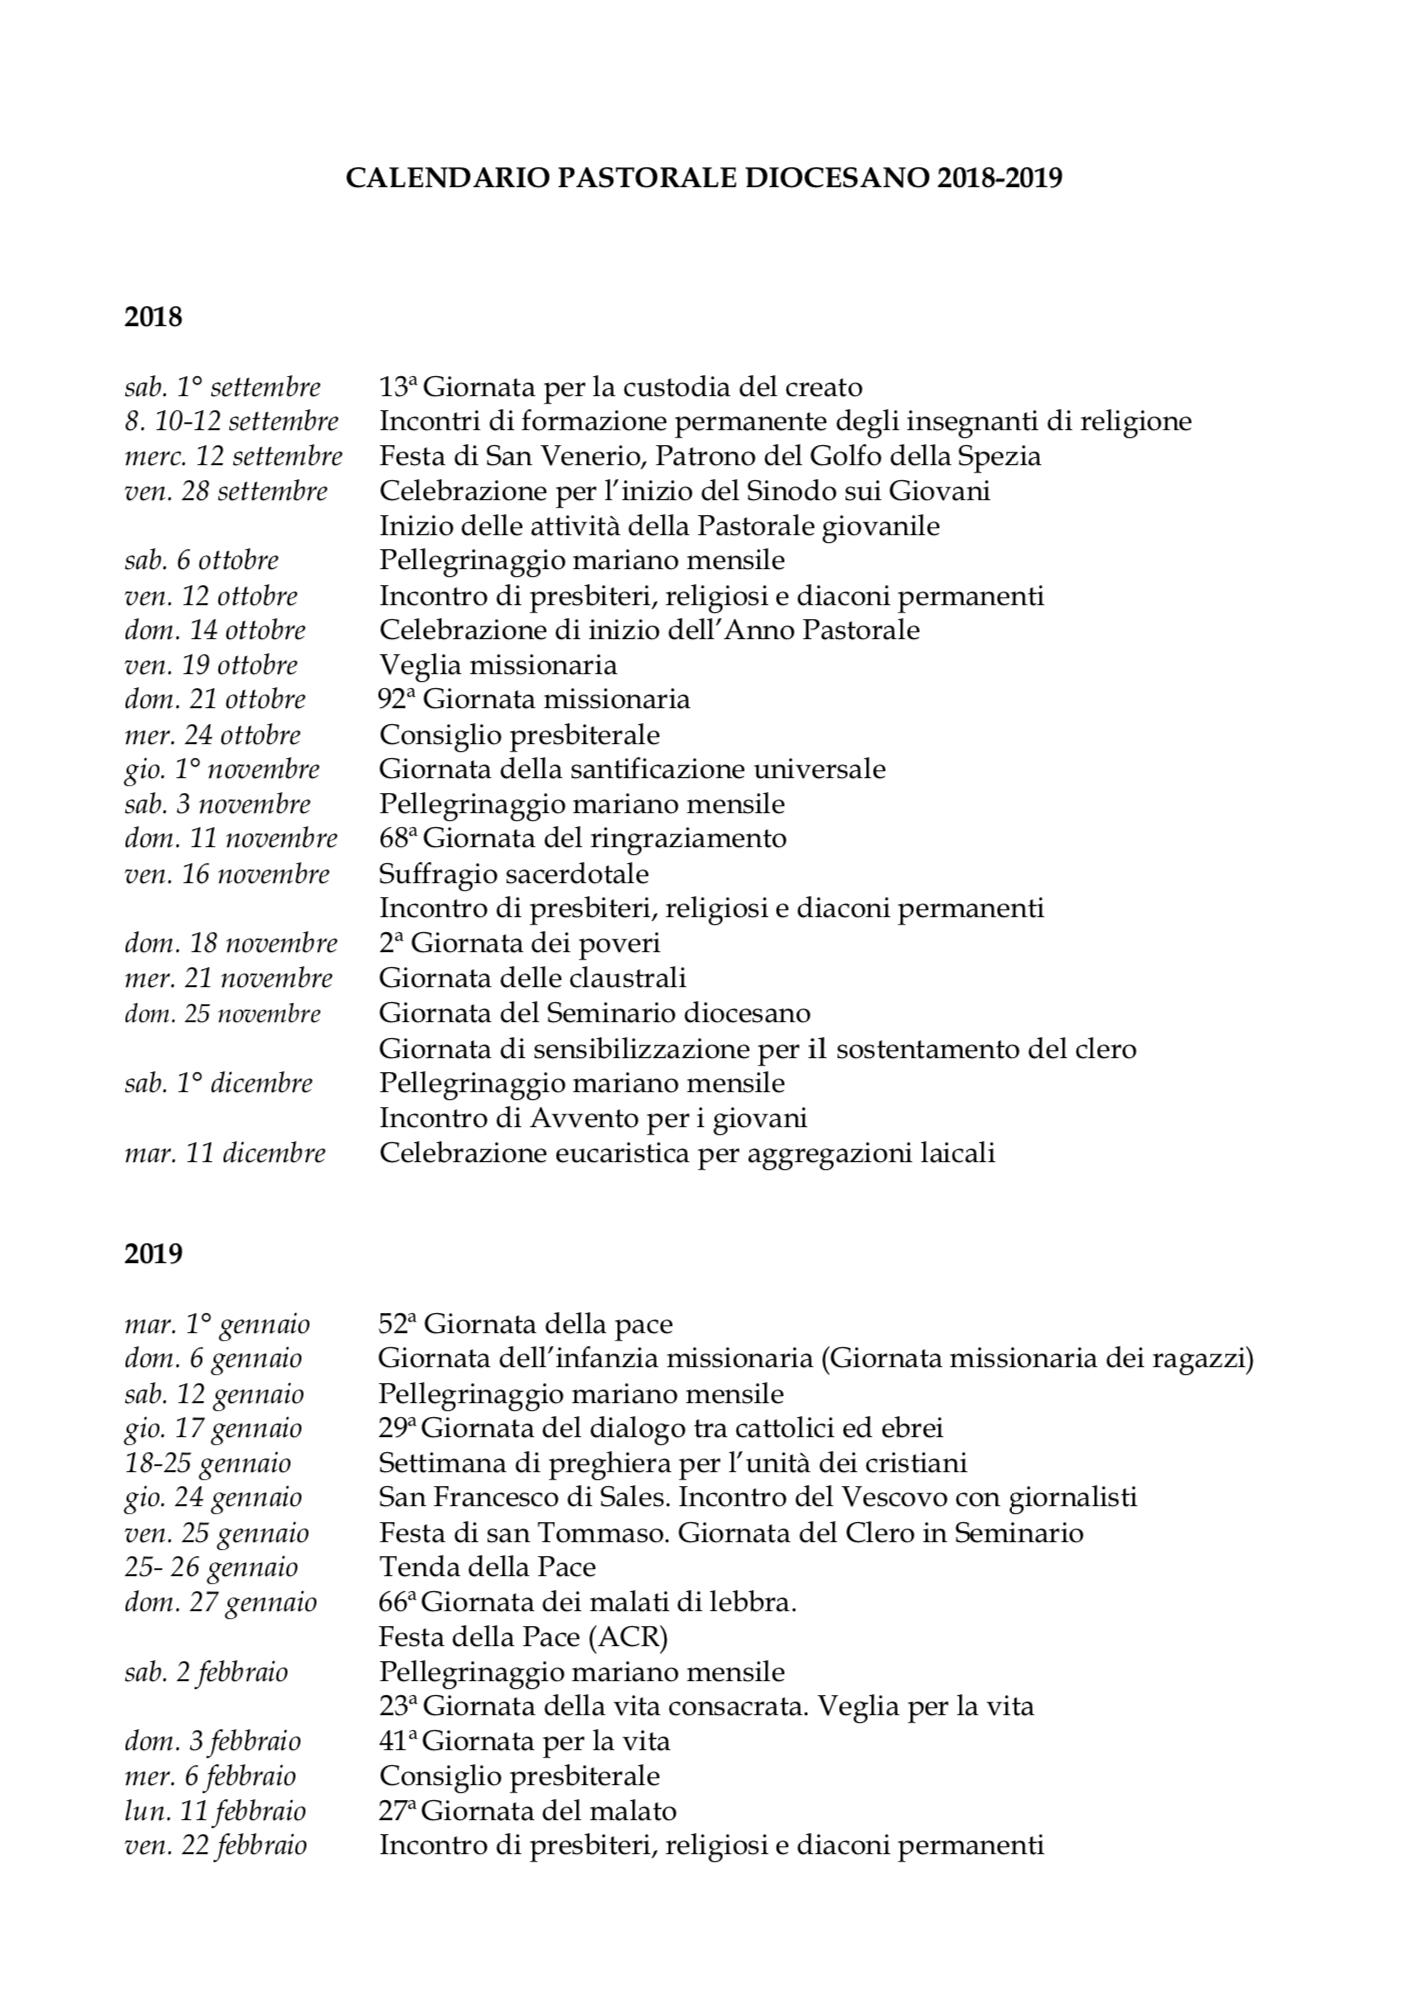 Calendario Pastorale 2020.Calendario Pastorale Diocesano 2018 2019 Diocesi Della